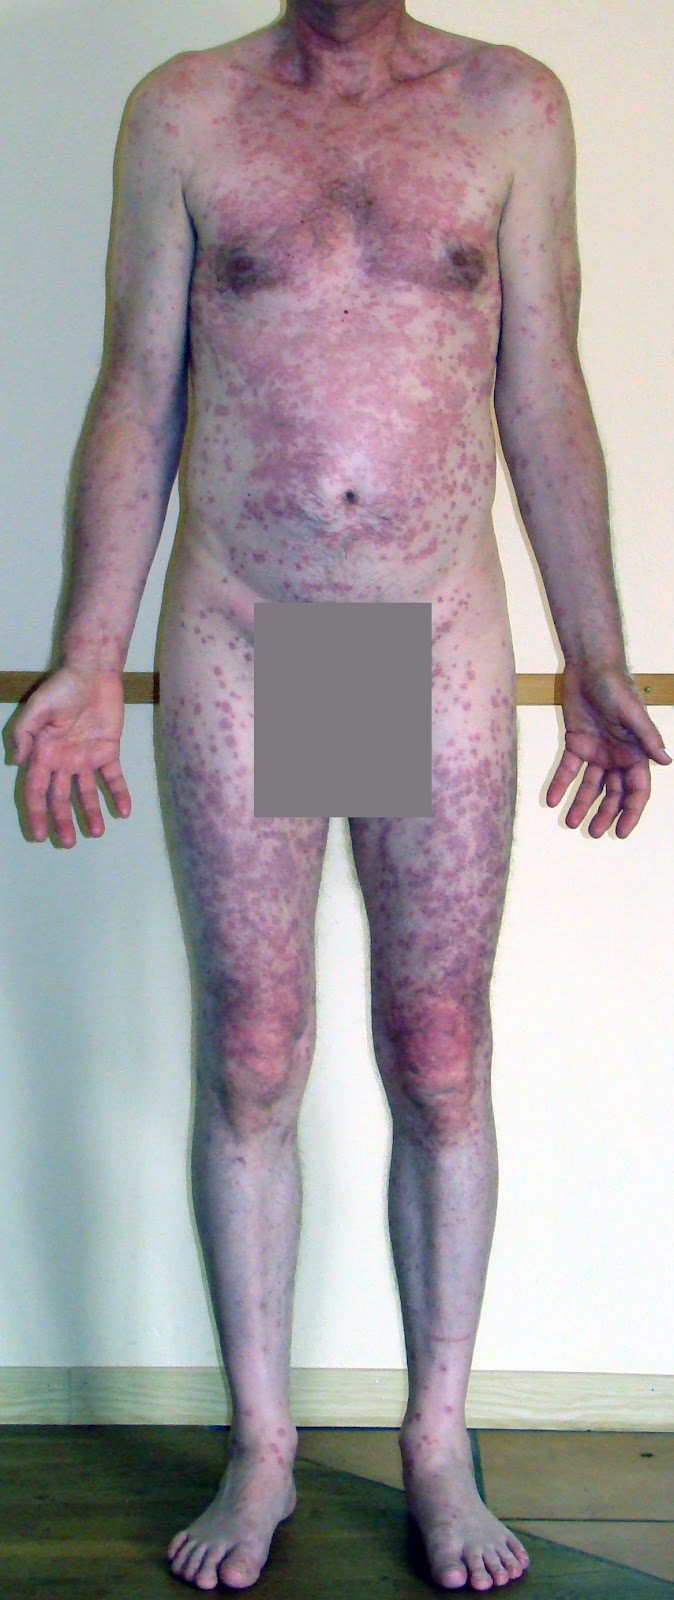 micardis telmisartan 80 mg side effects